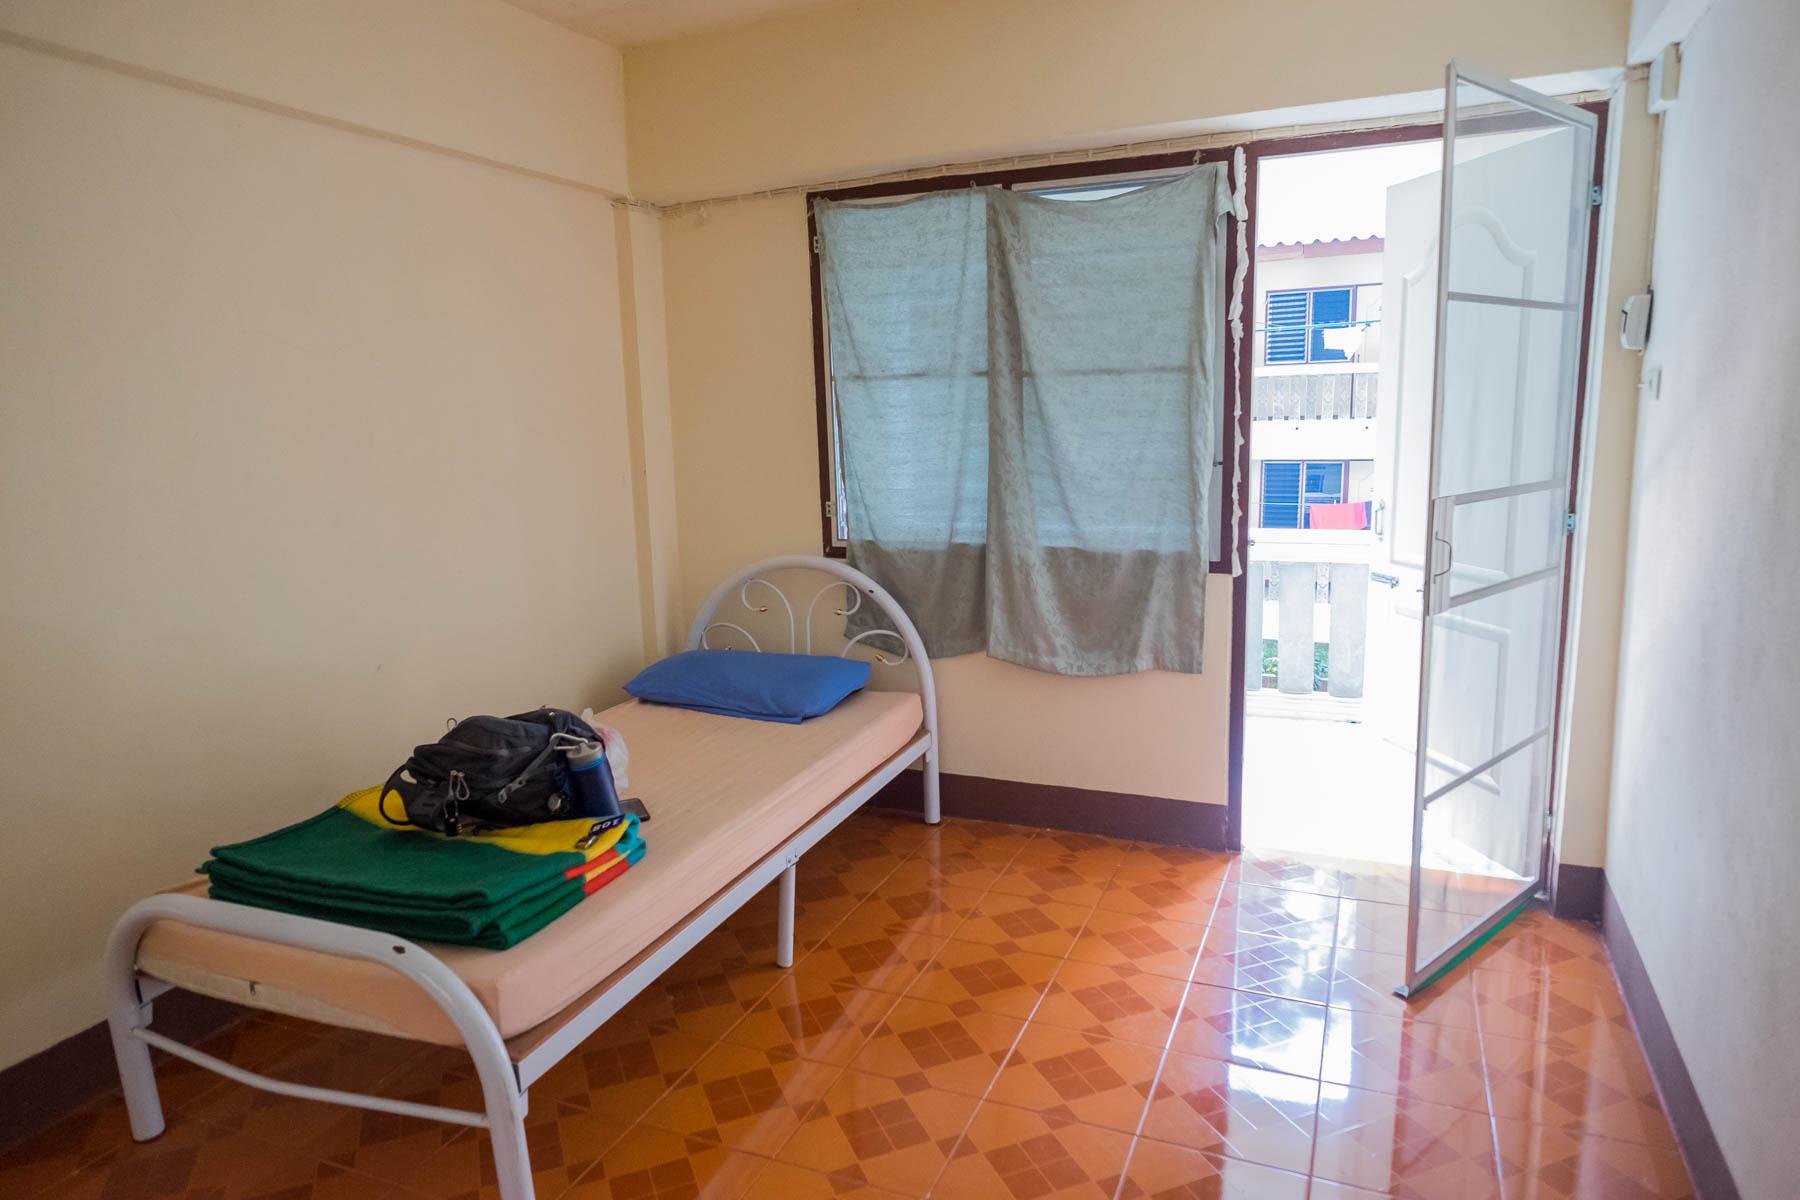 Meditation center accommodation room